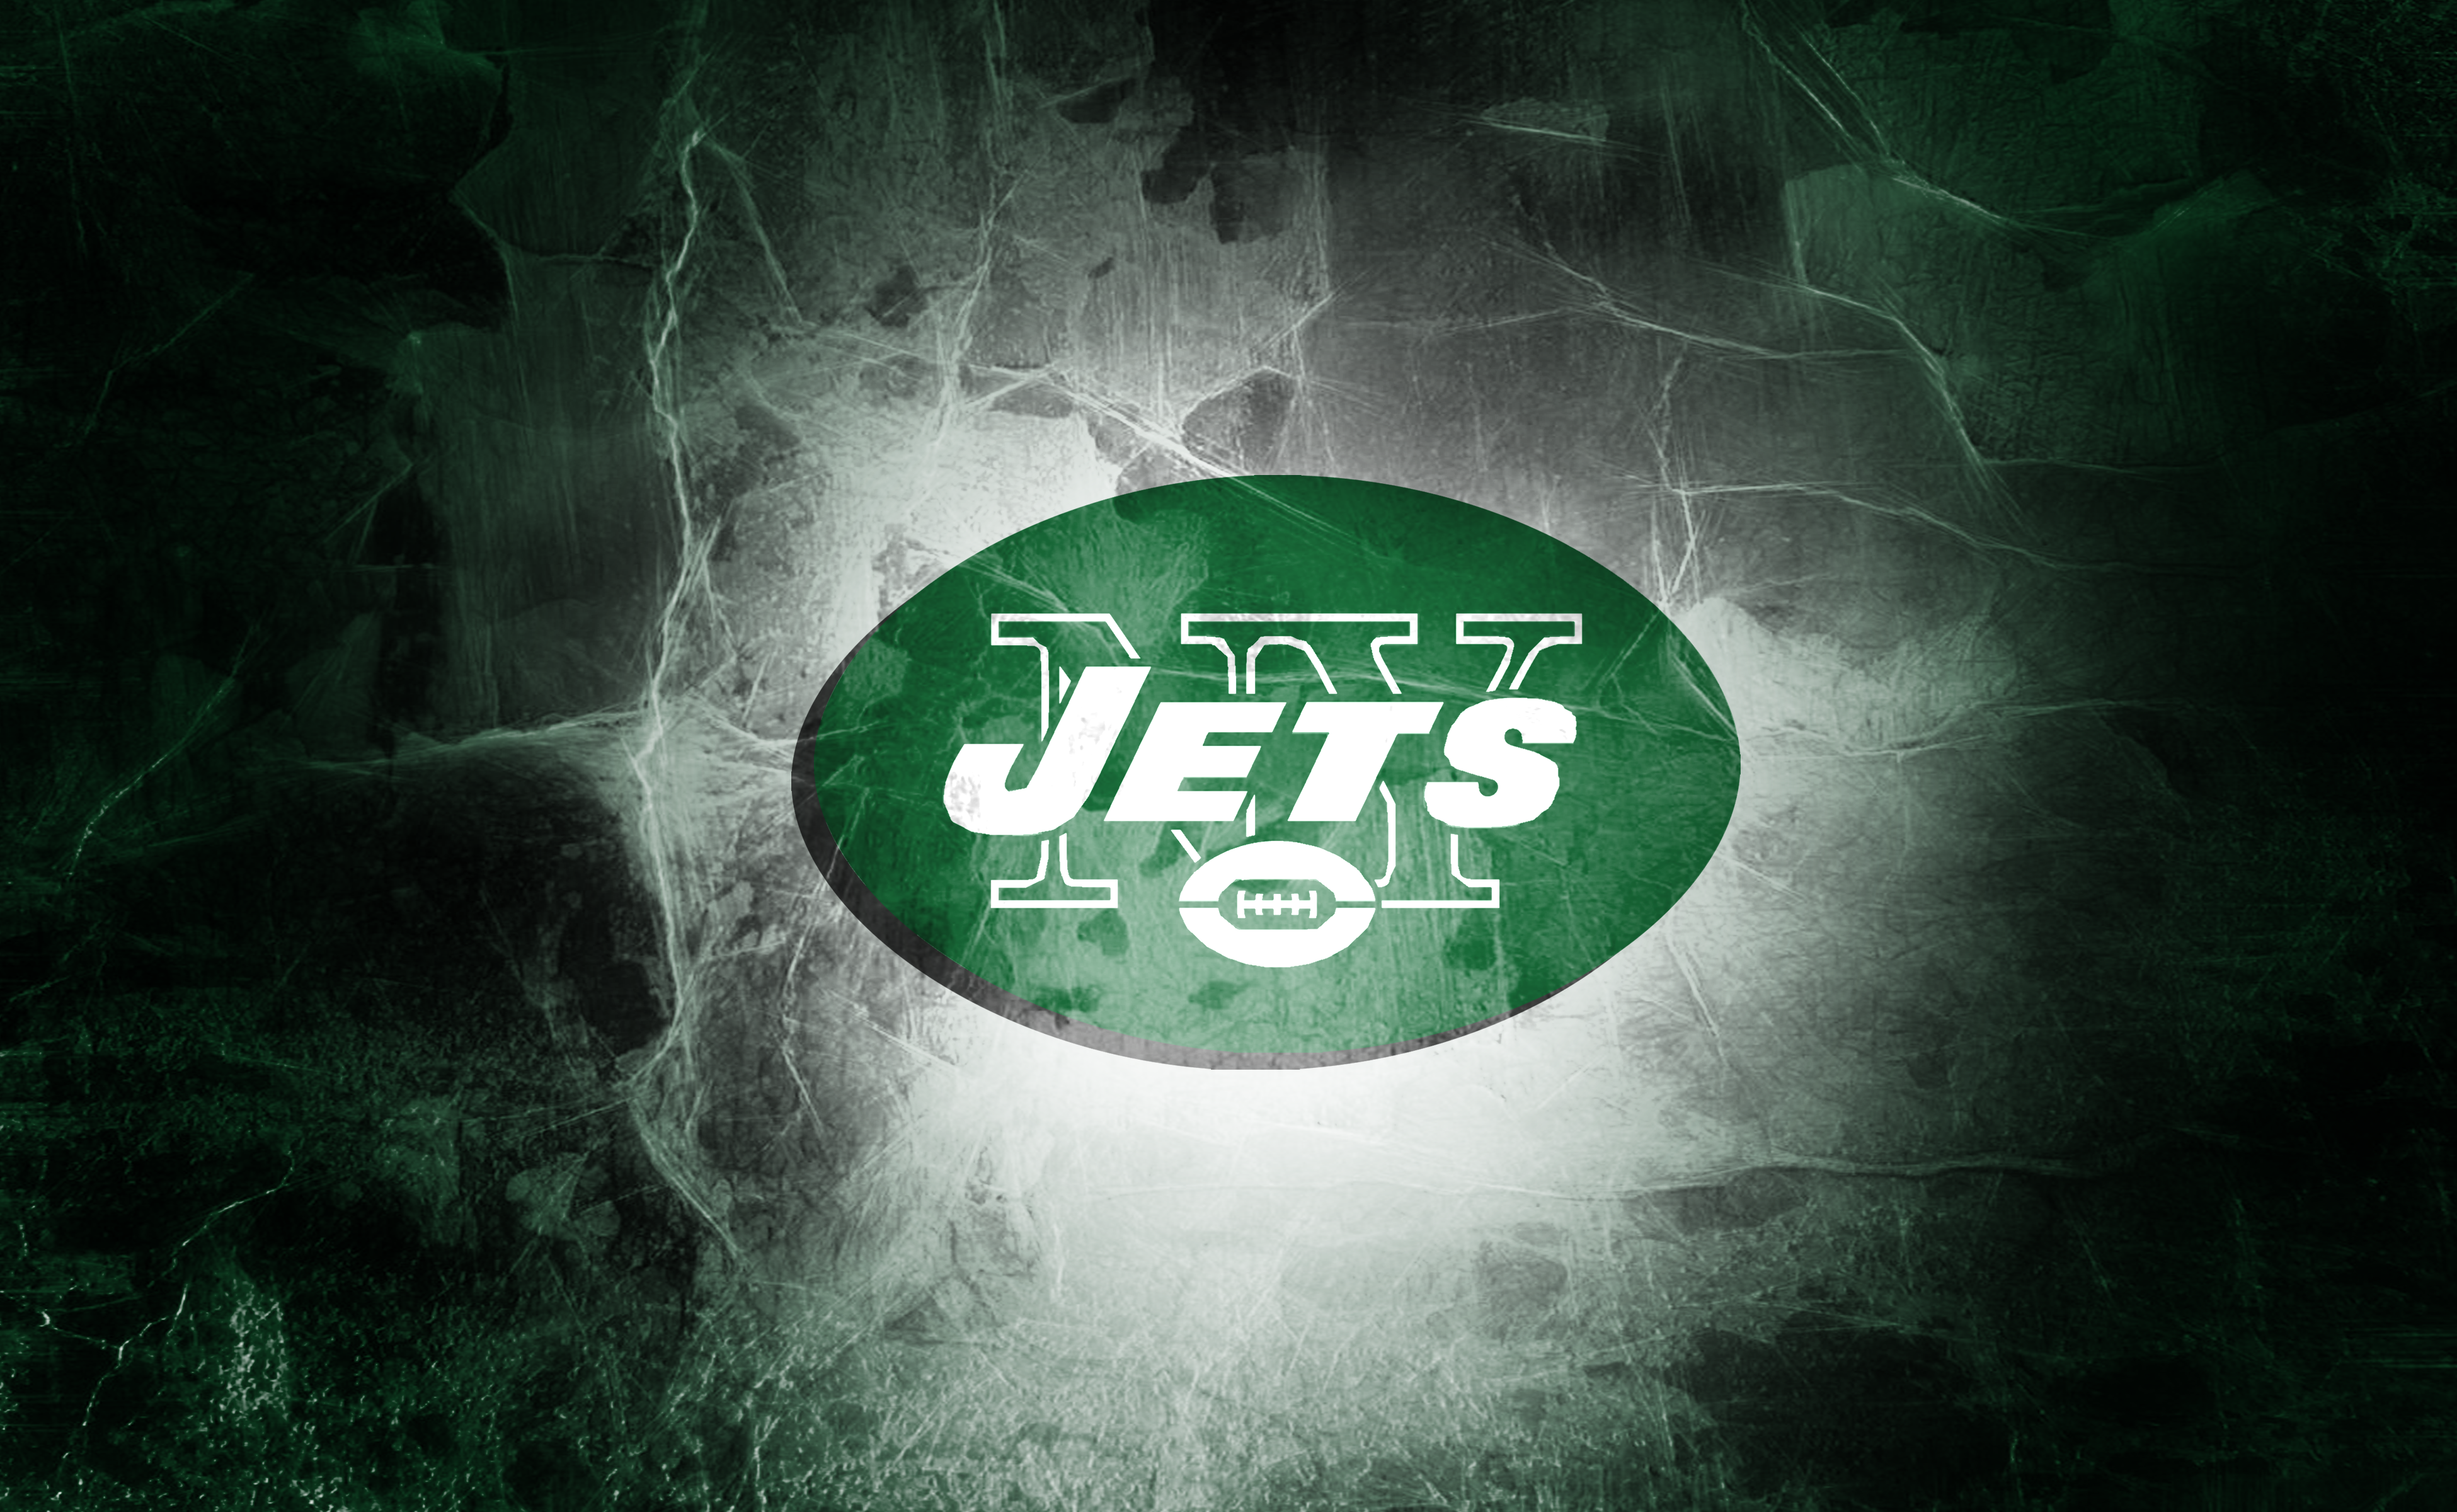 48 New York Jets Wallpaper Iphone On Wallpapersafari